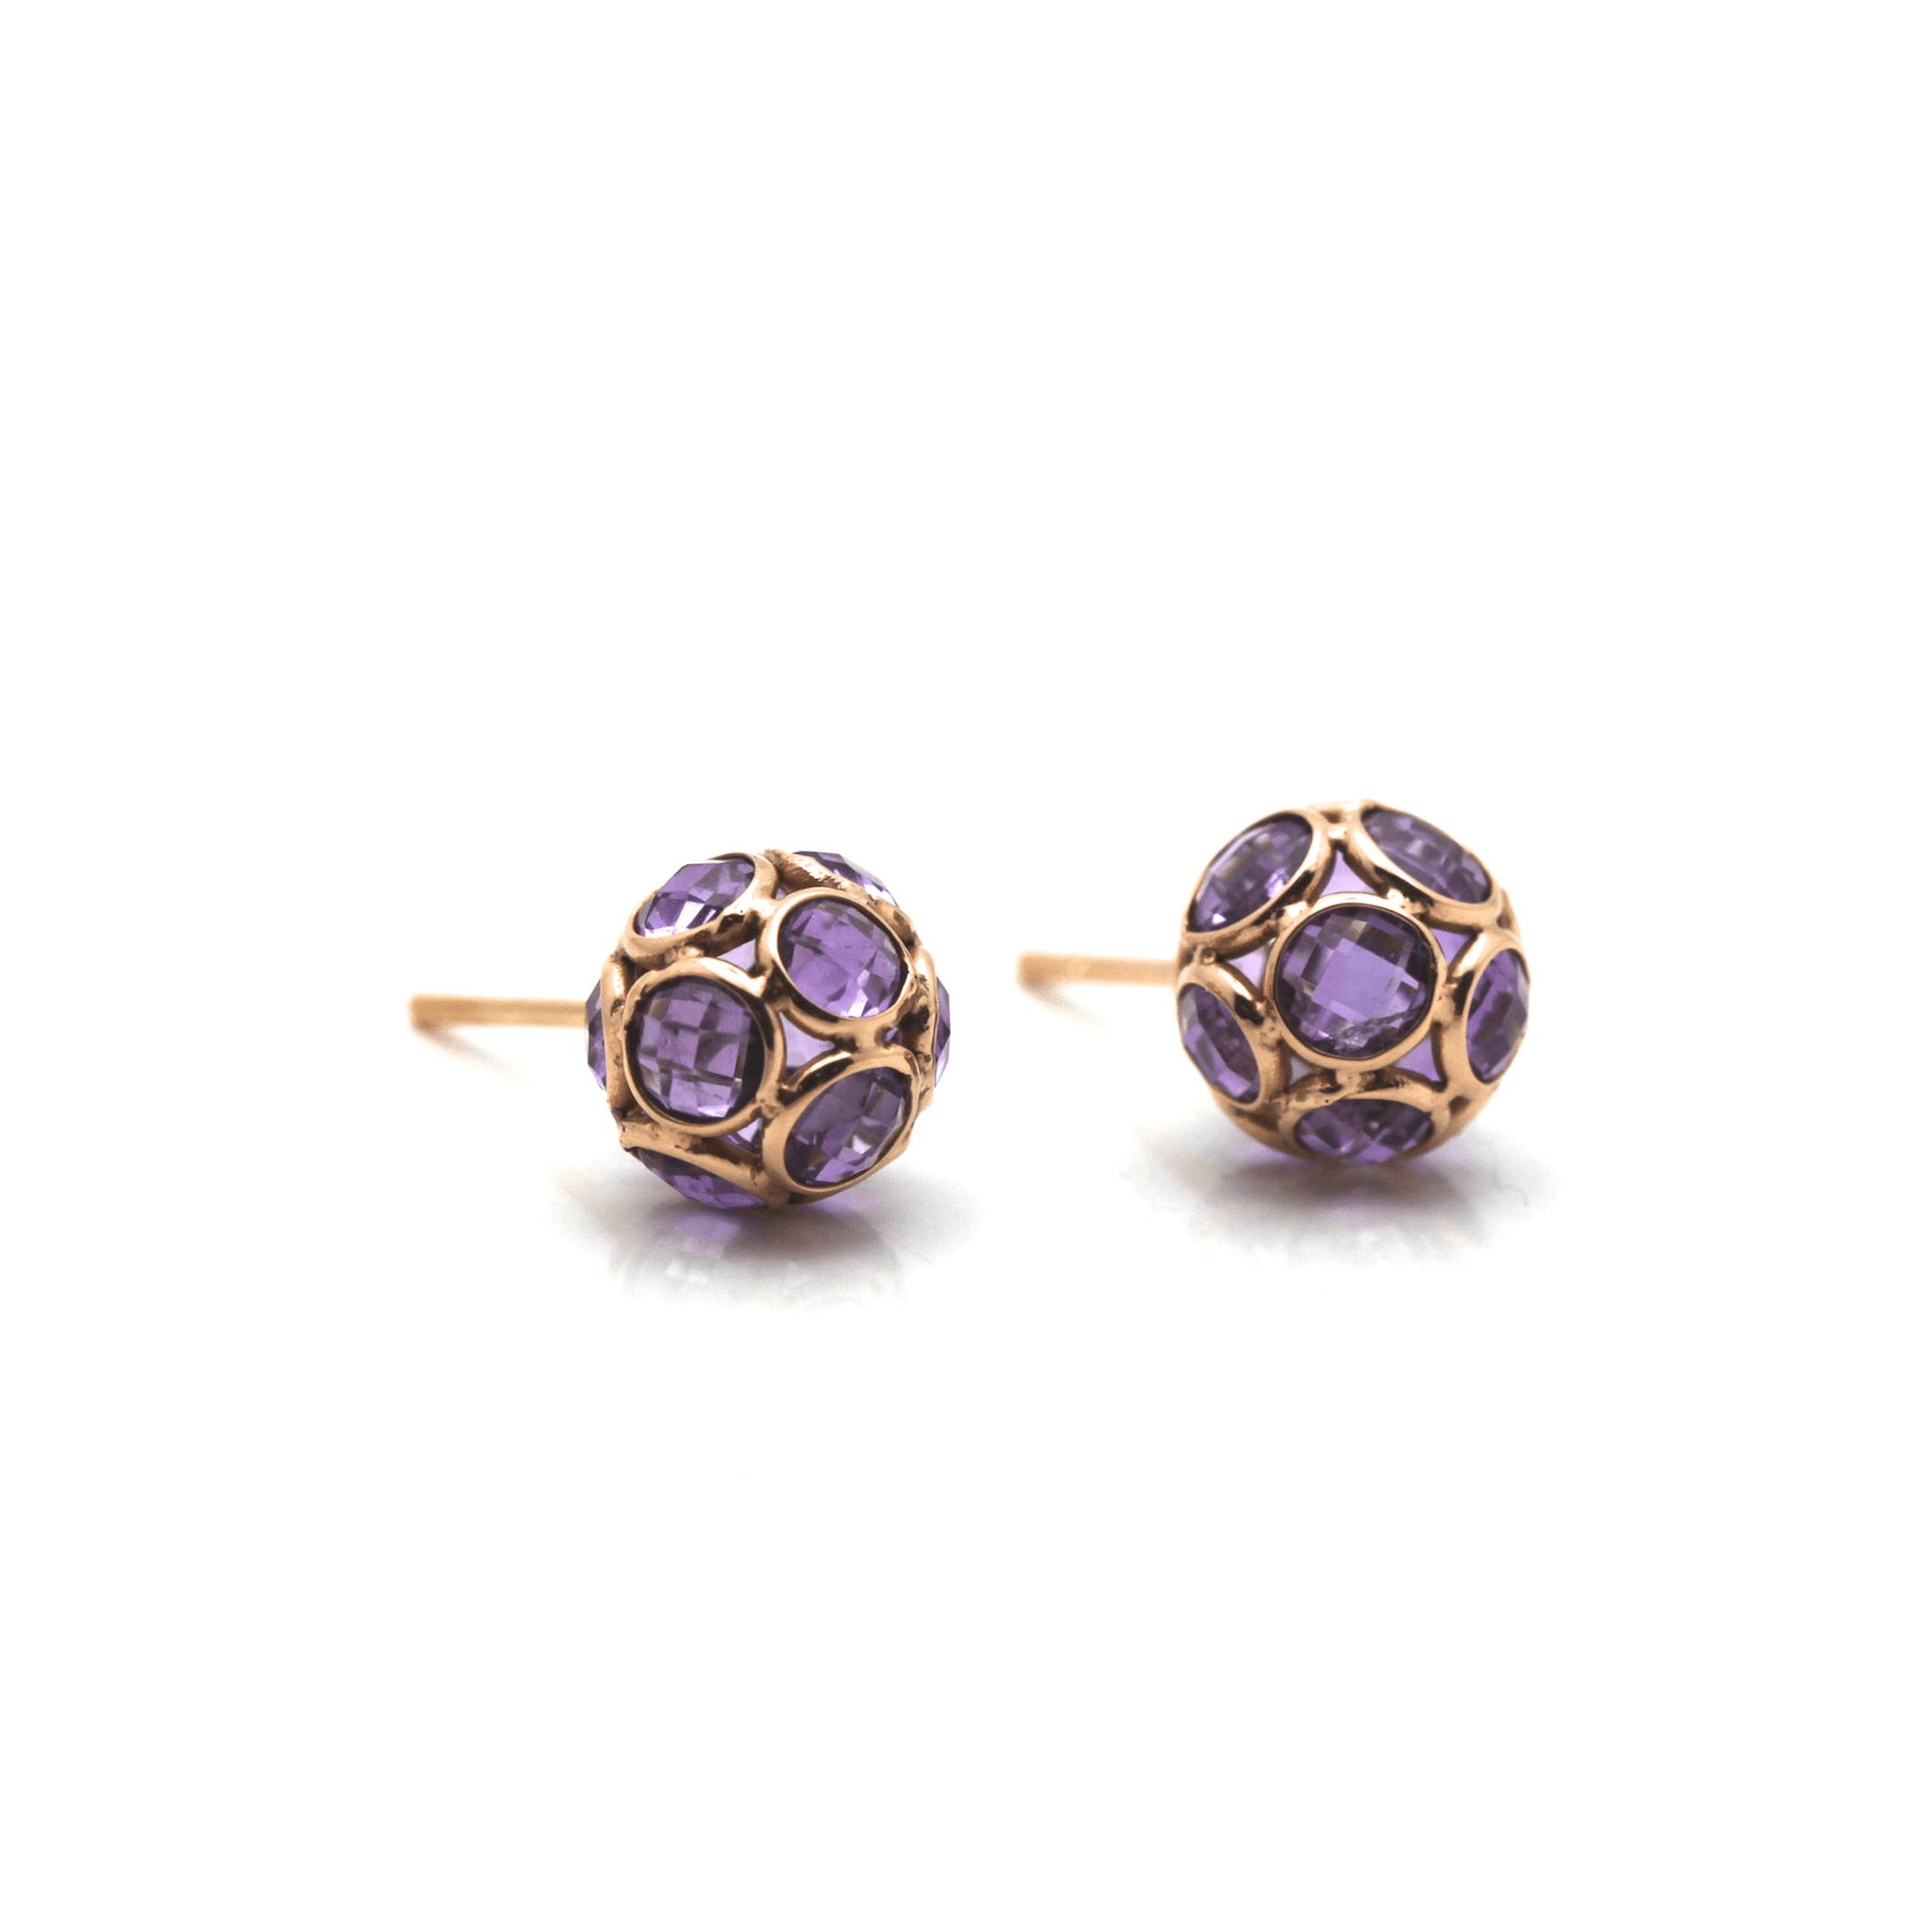 Tresor Collection - Gemstone Origami Sphere Ball Stud Earrings in 18K Rose Gold